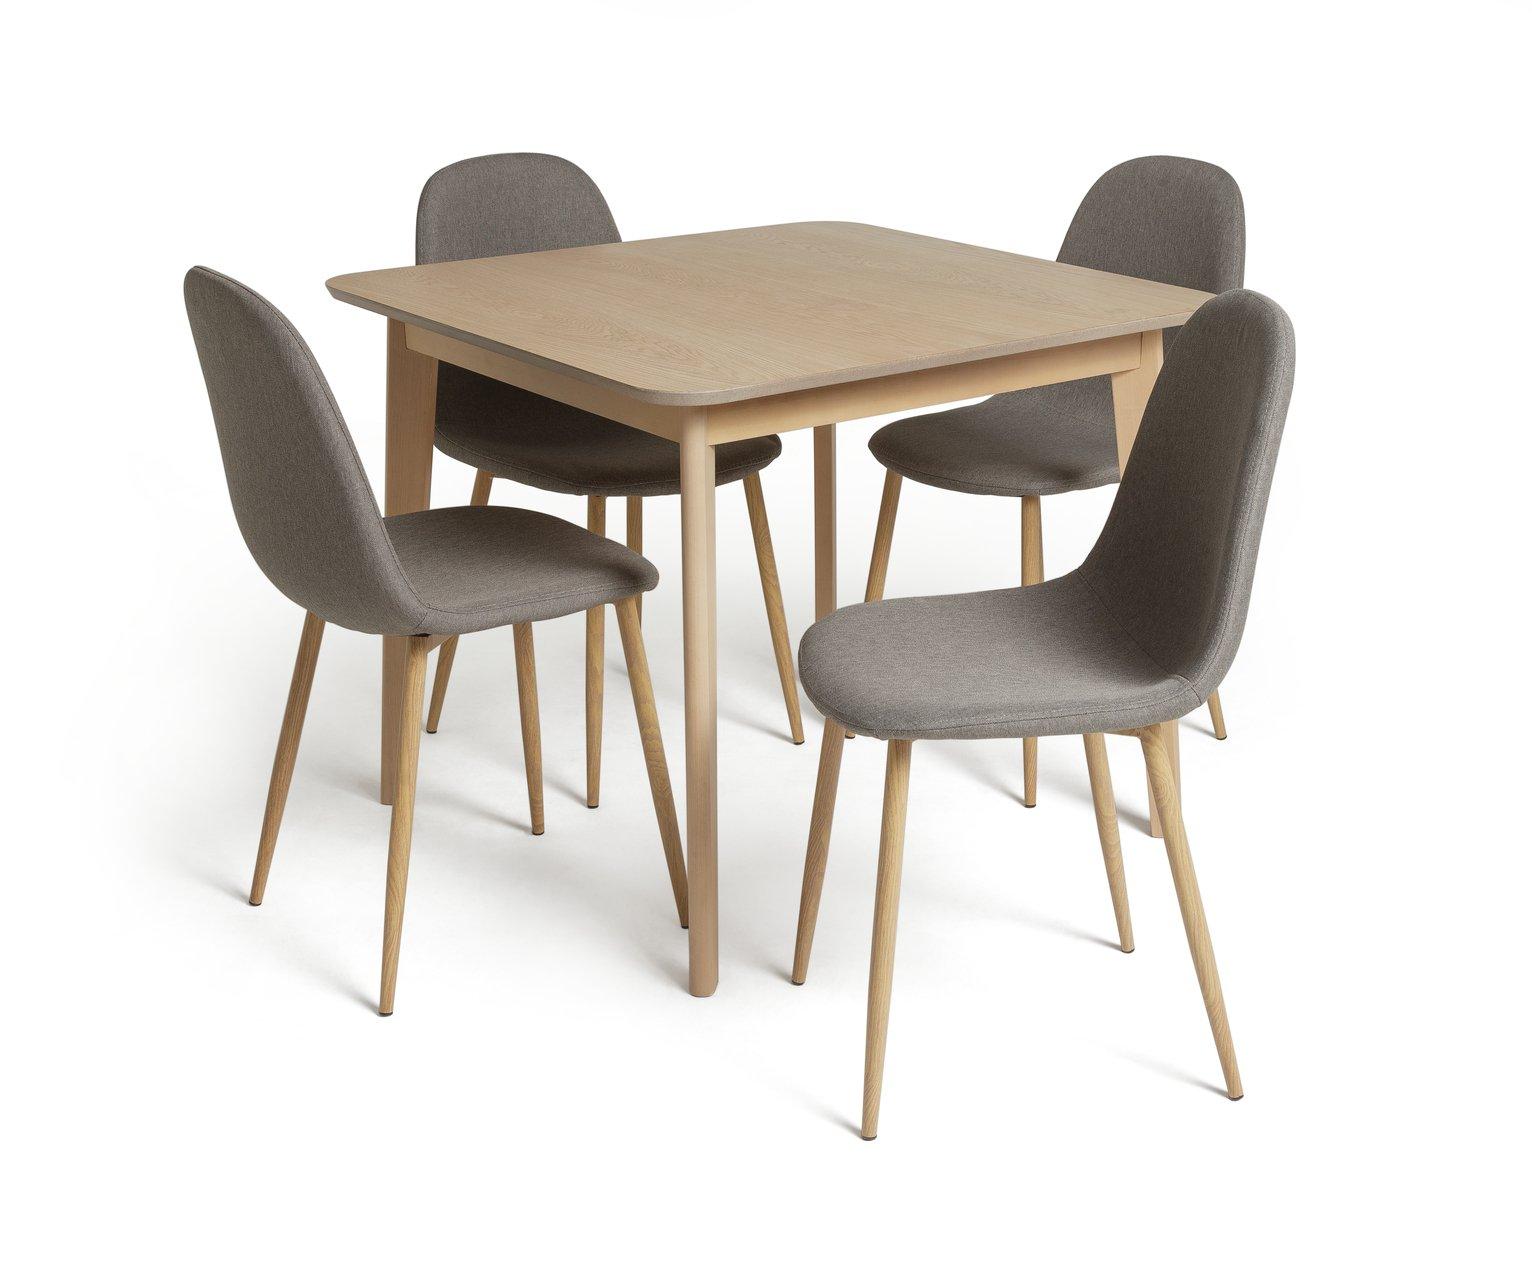 Habitat Skandi Oak Dining Table and 4 Beni Grey Chairs